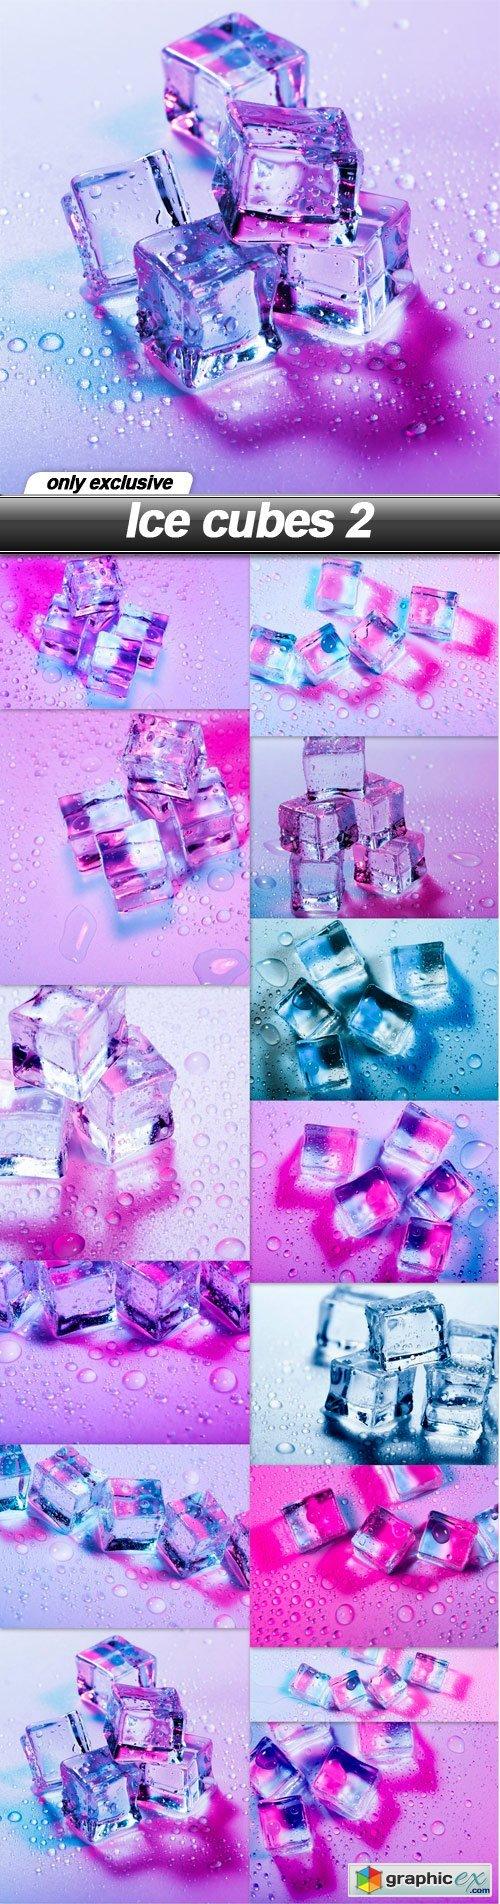 Ice cubes 2 - 14 UHQ JPEG